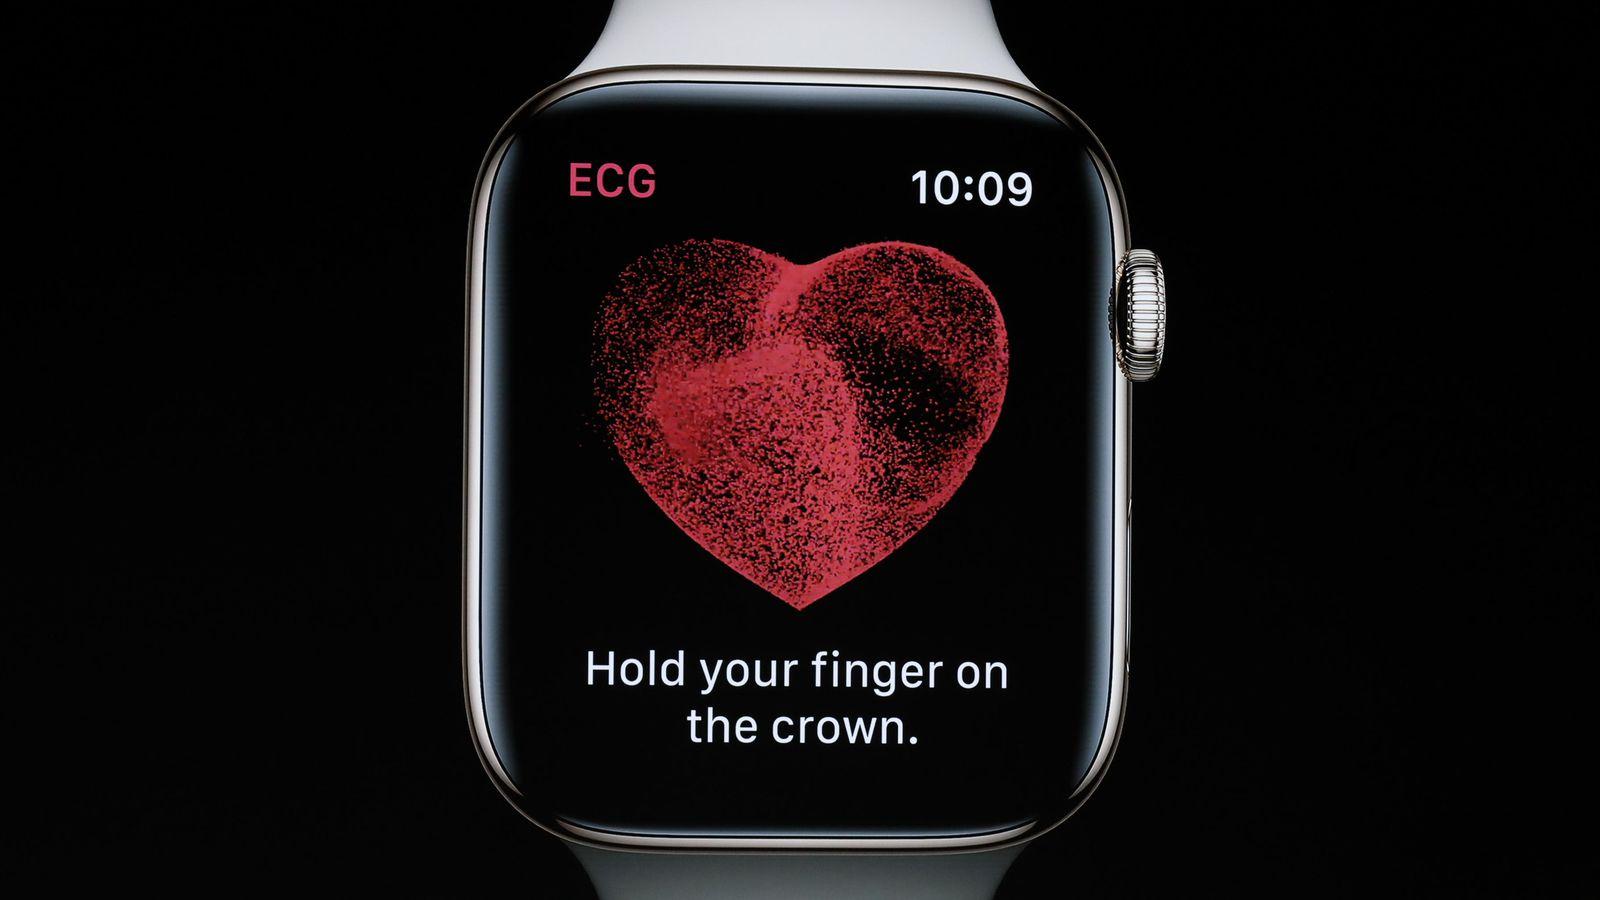 apple event 091218 apple watch ecg ekg 0243 - Ming-Chi Kuo: Apple prinesie nové keramické Apple Watch, EKG sa rozšíri do sveta